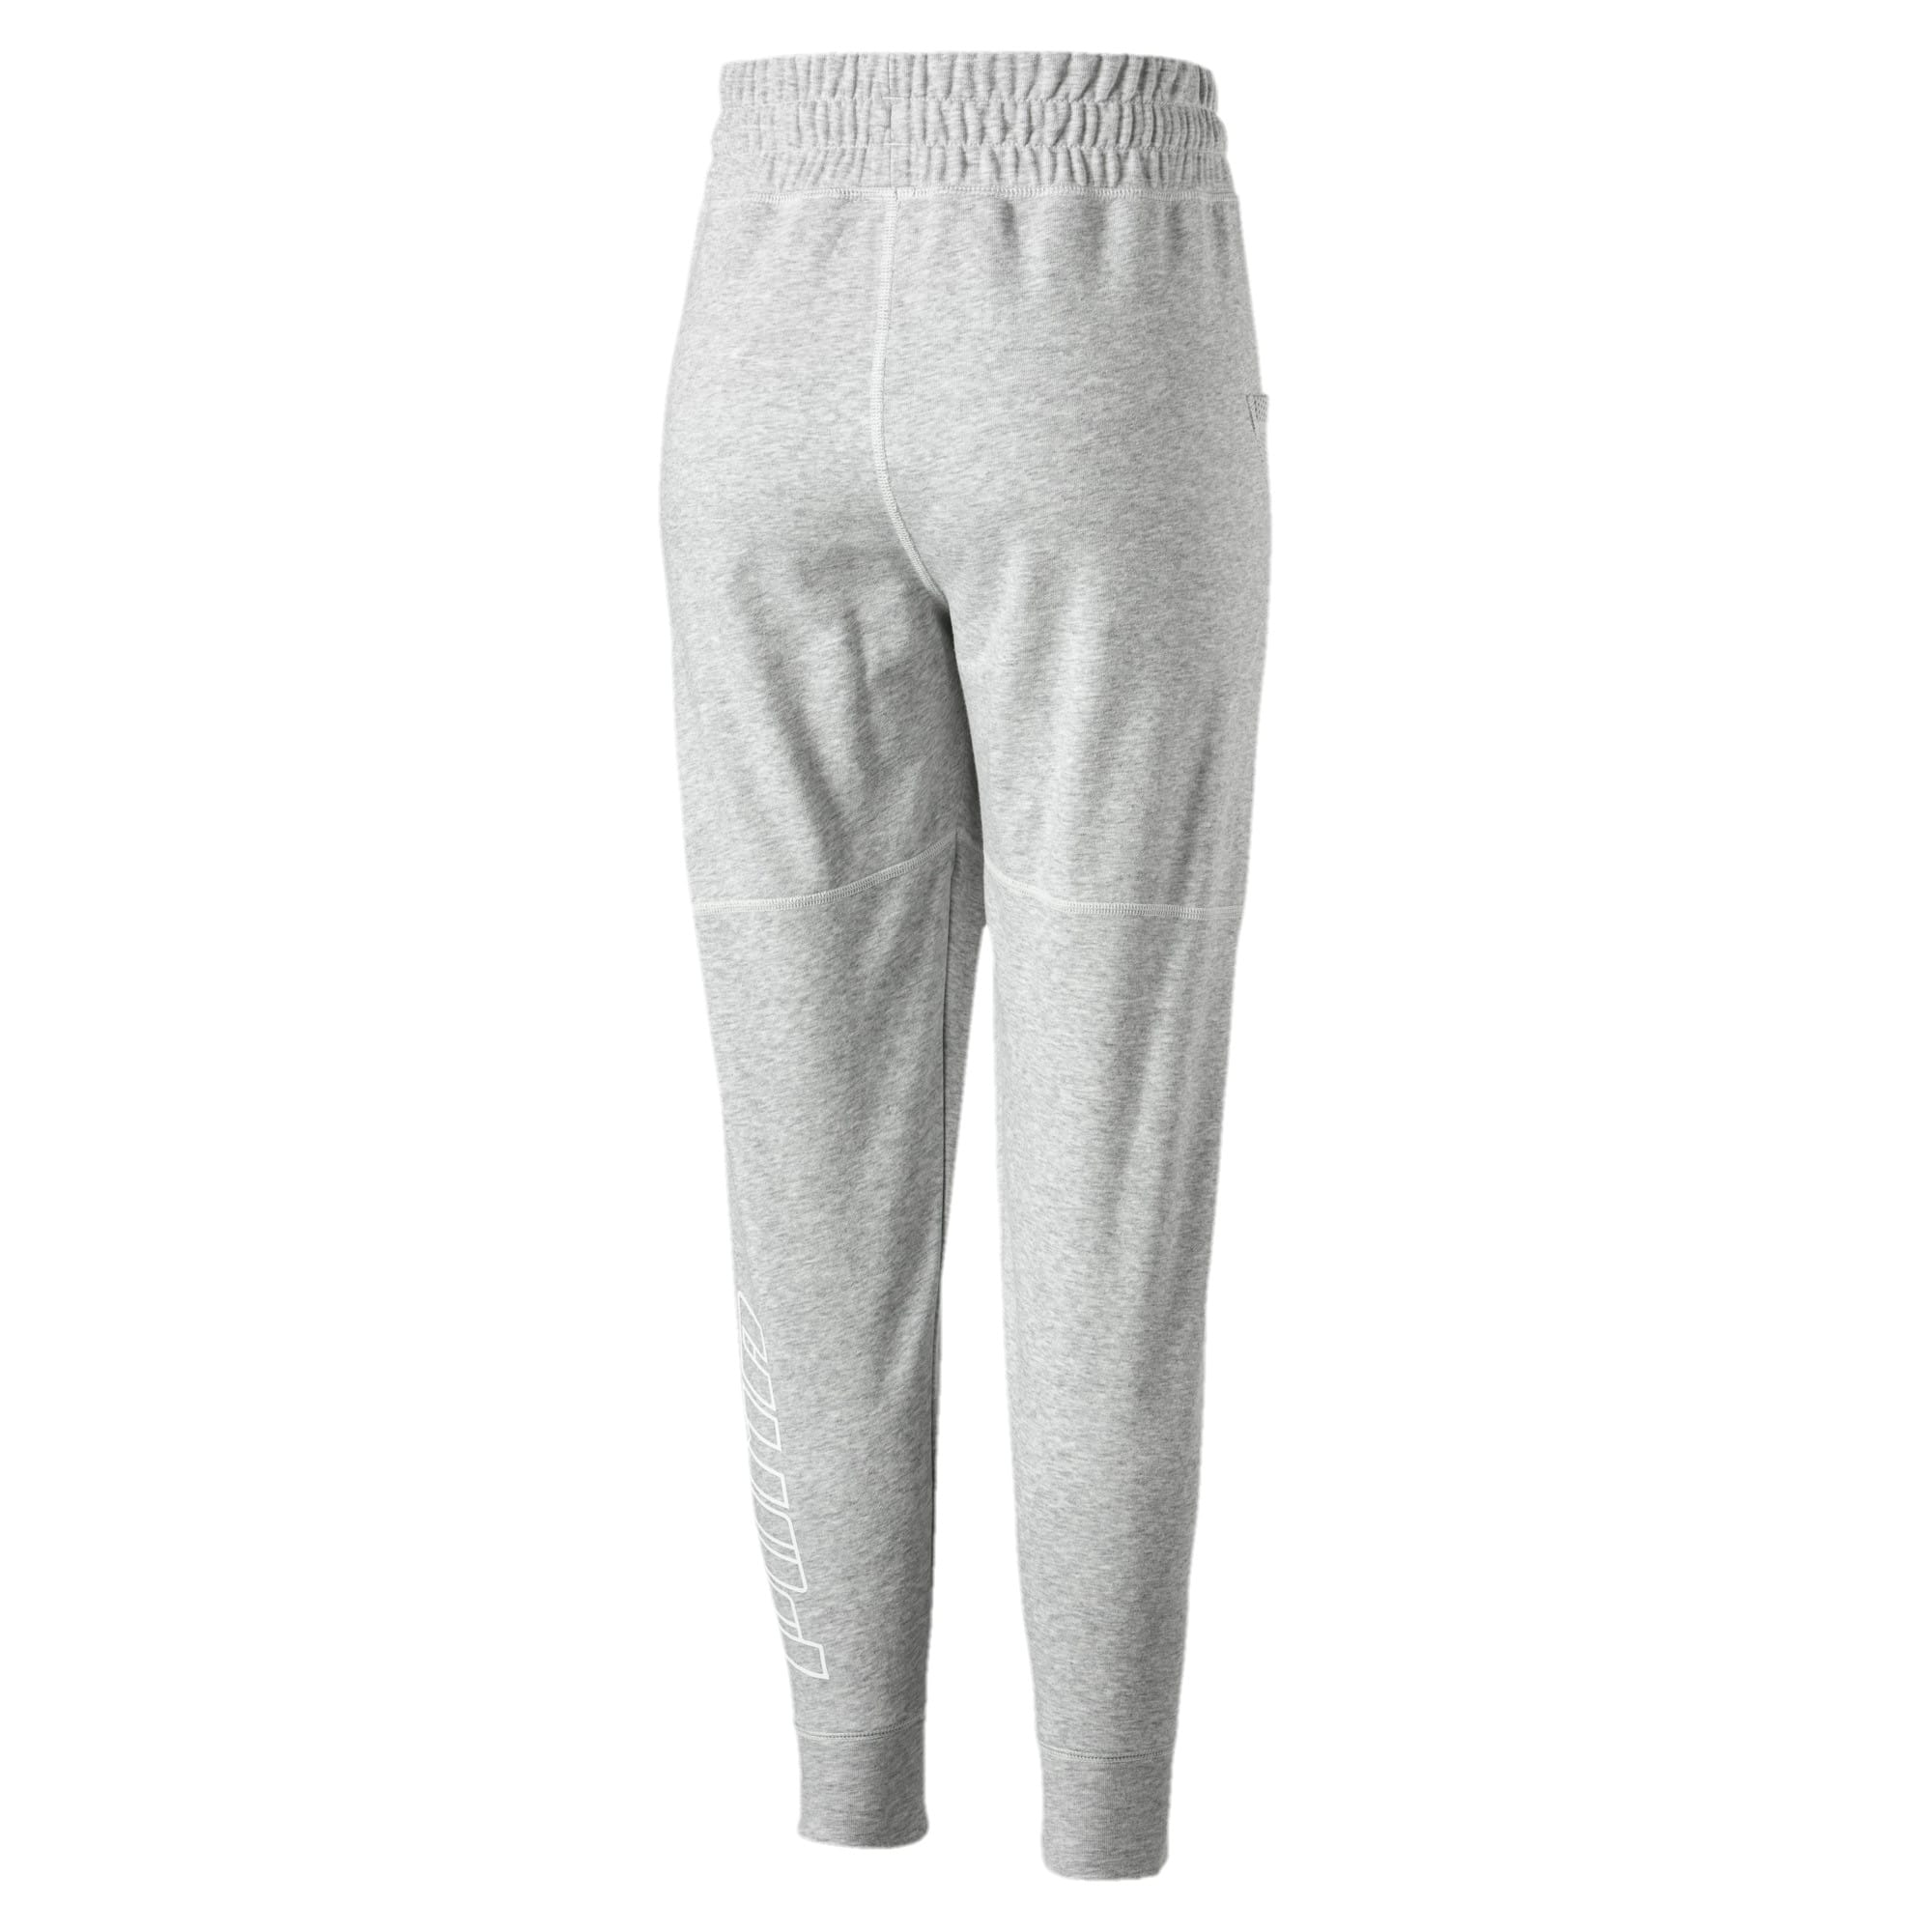 Thumbnail 3 of Yogini Women's 7/8 Pants, Light Gray Heather, medium